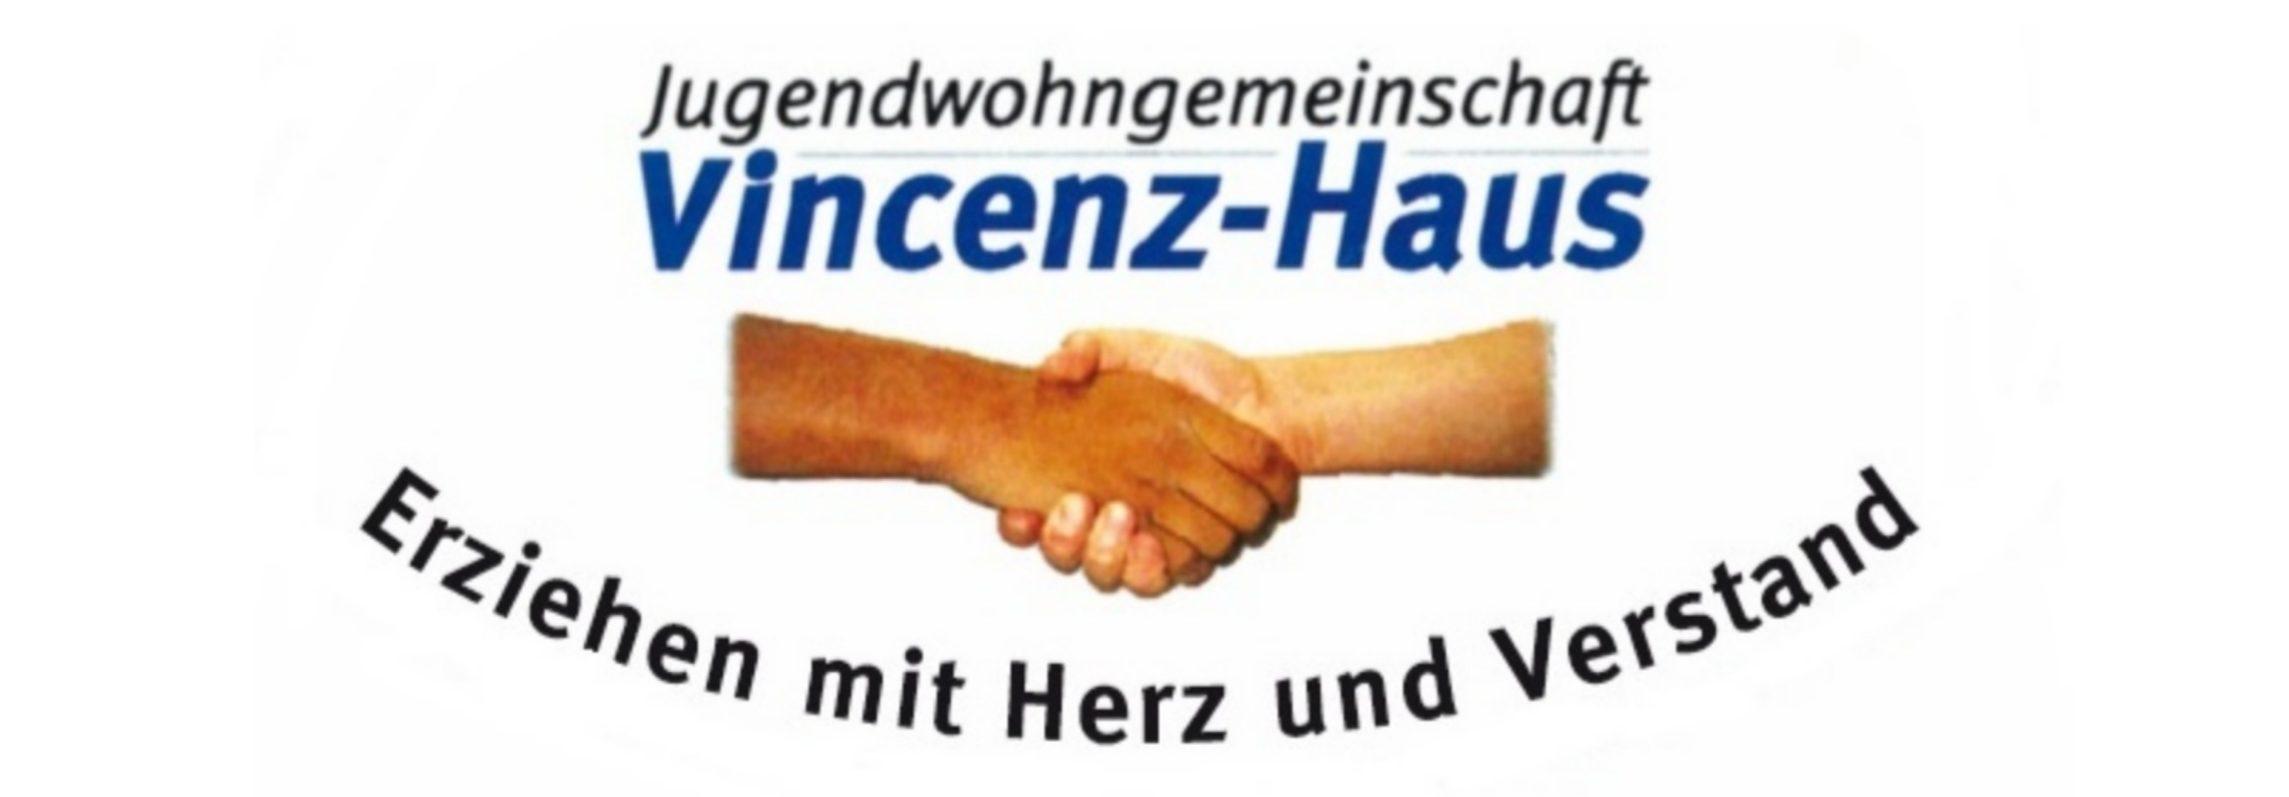 Jugendwohngemeinschaft Vincenz-Haus